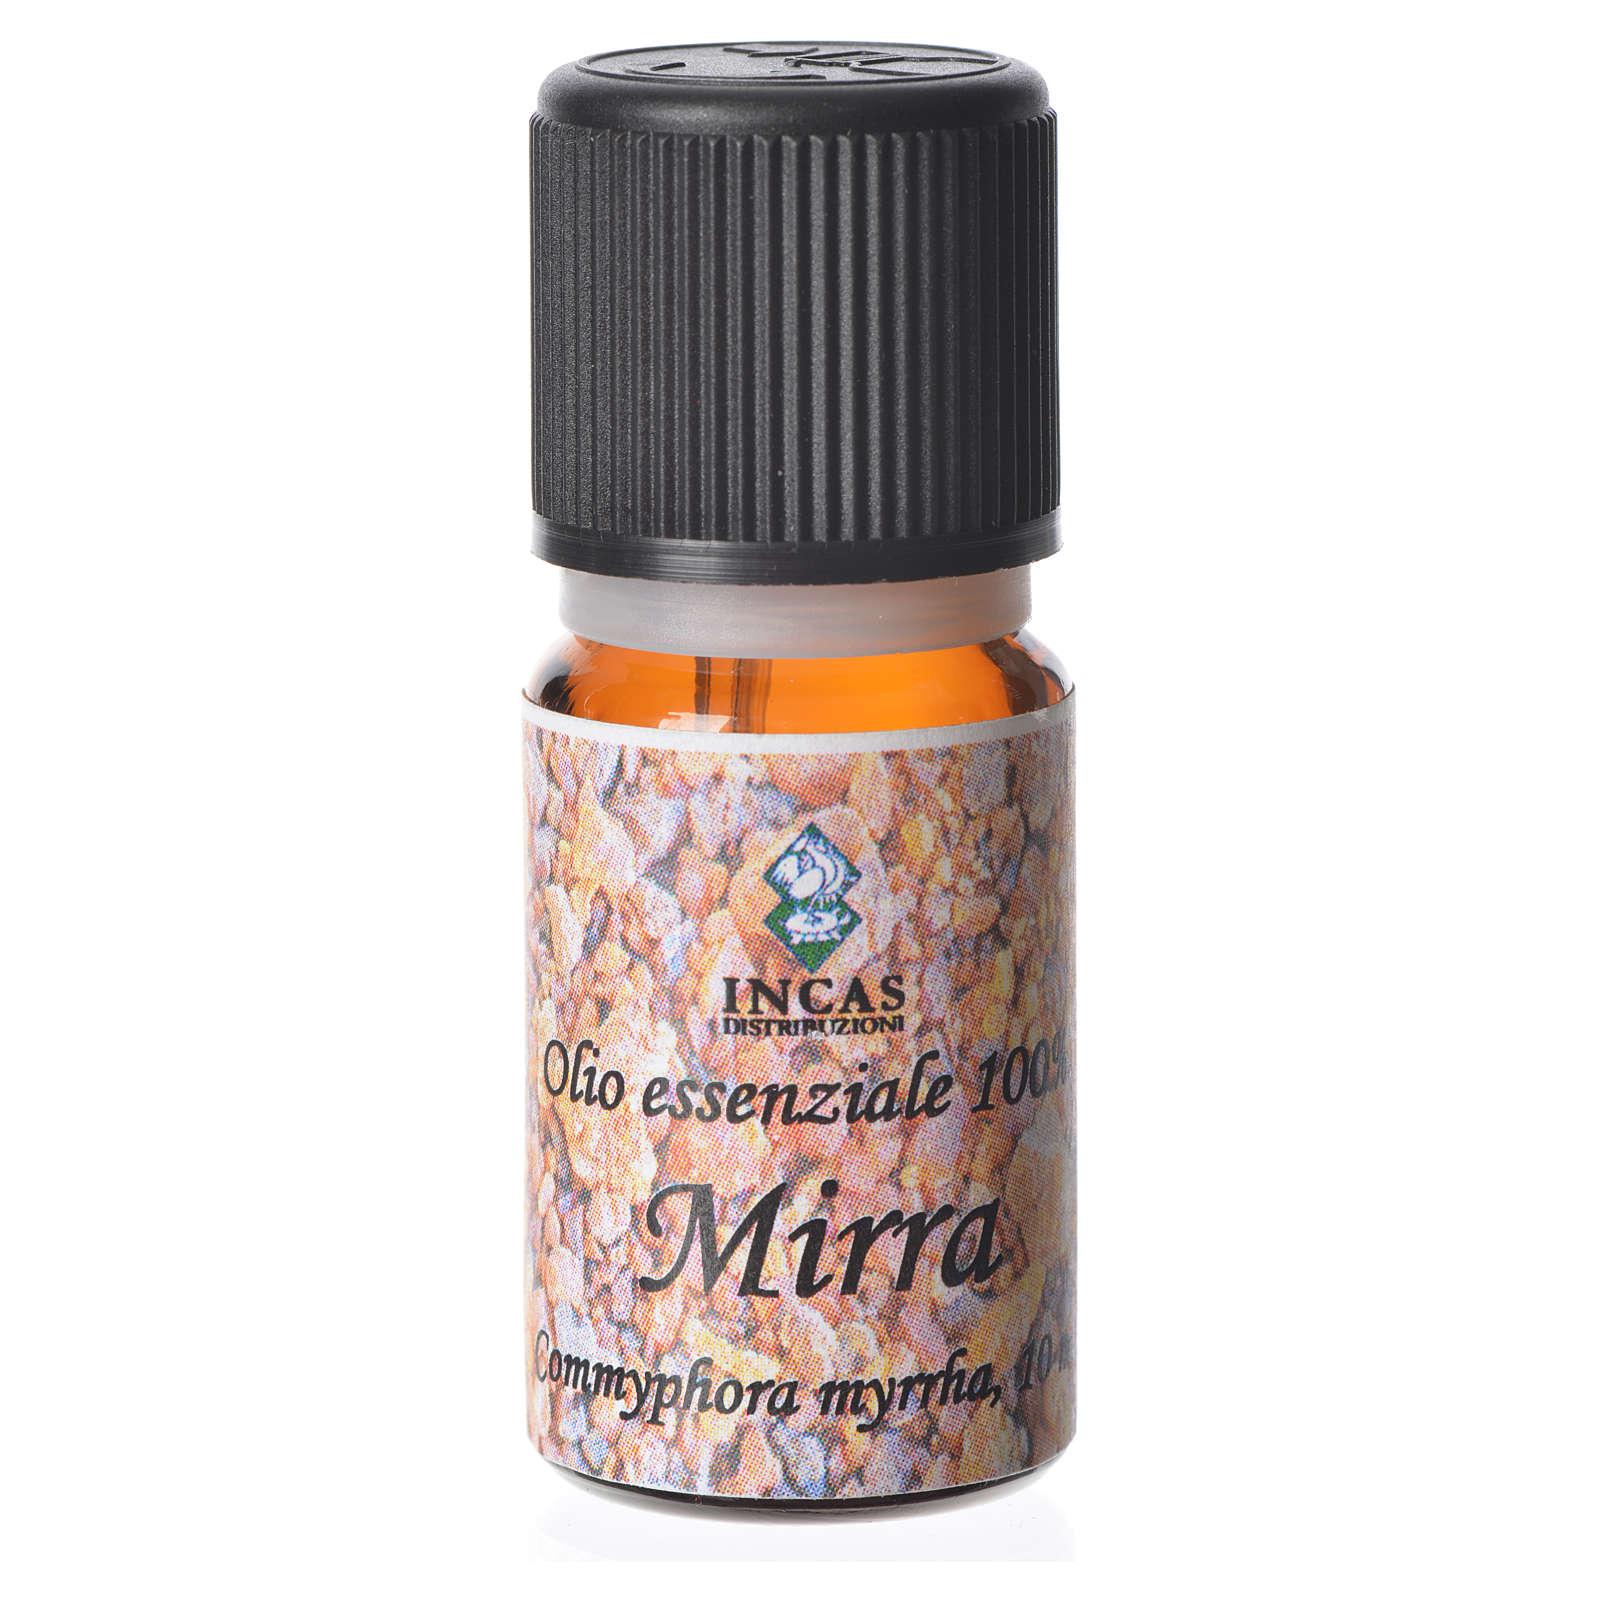 Myrrh essential oil, 100% pure 3